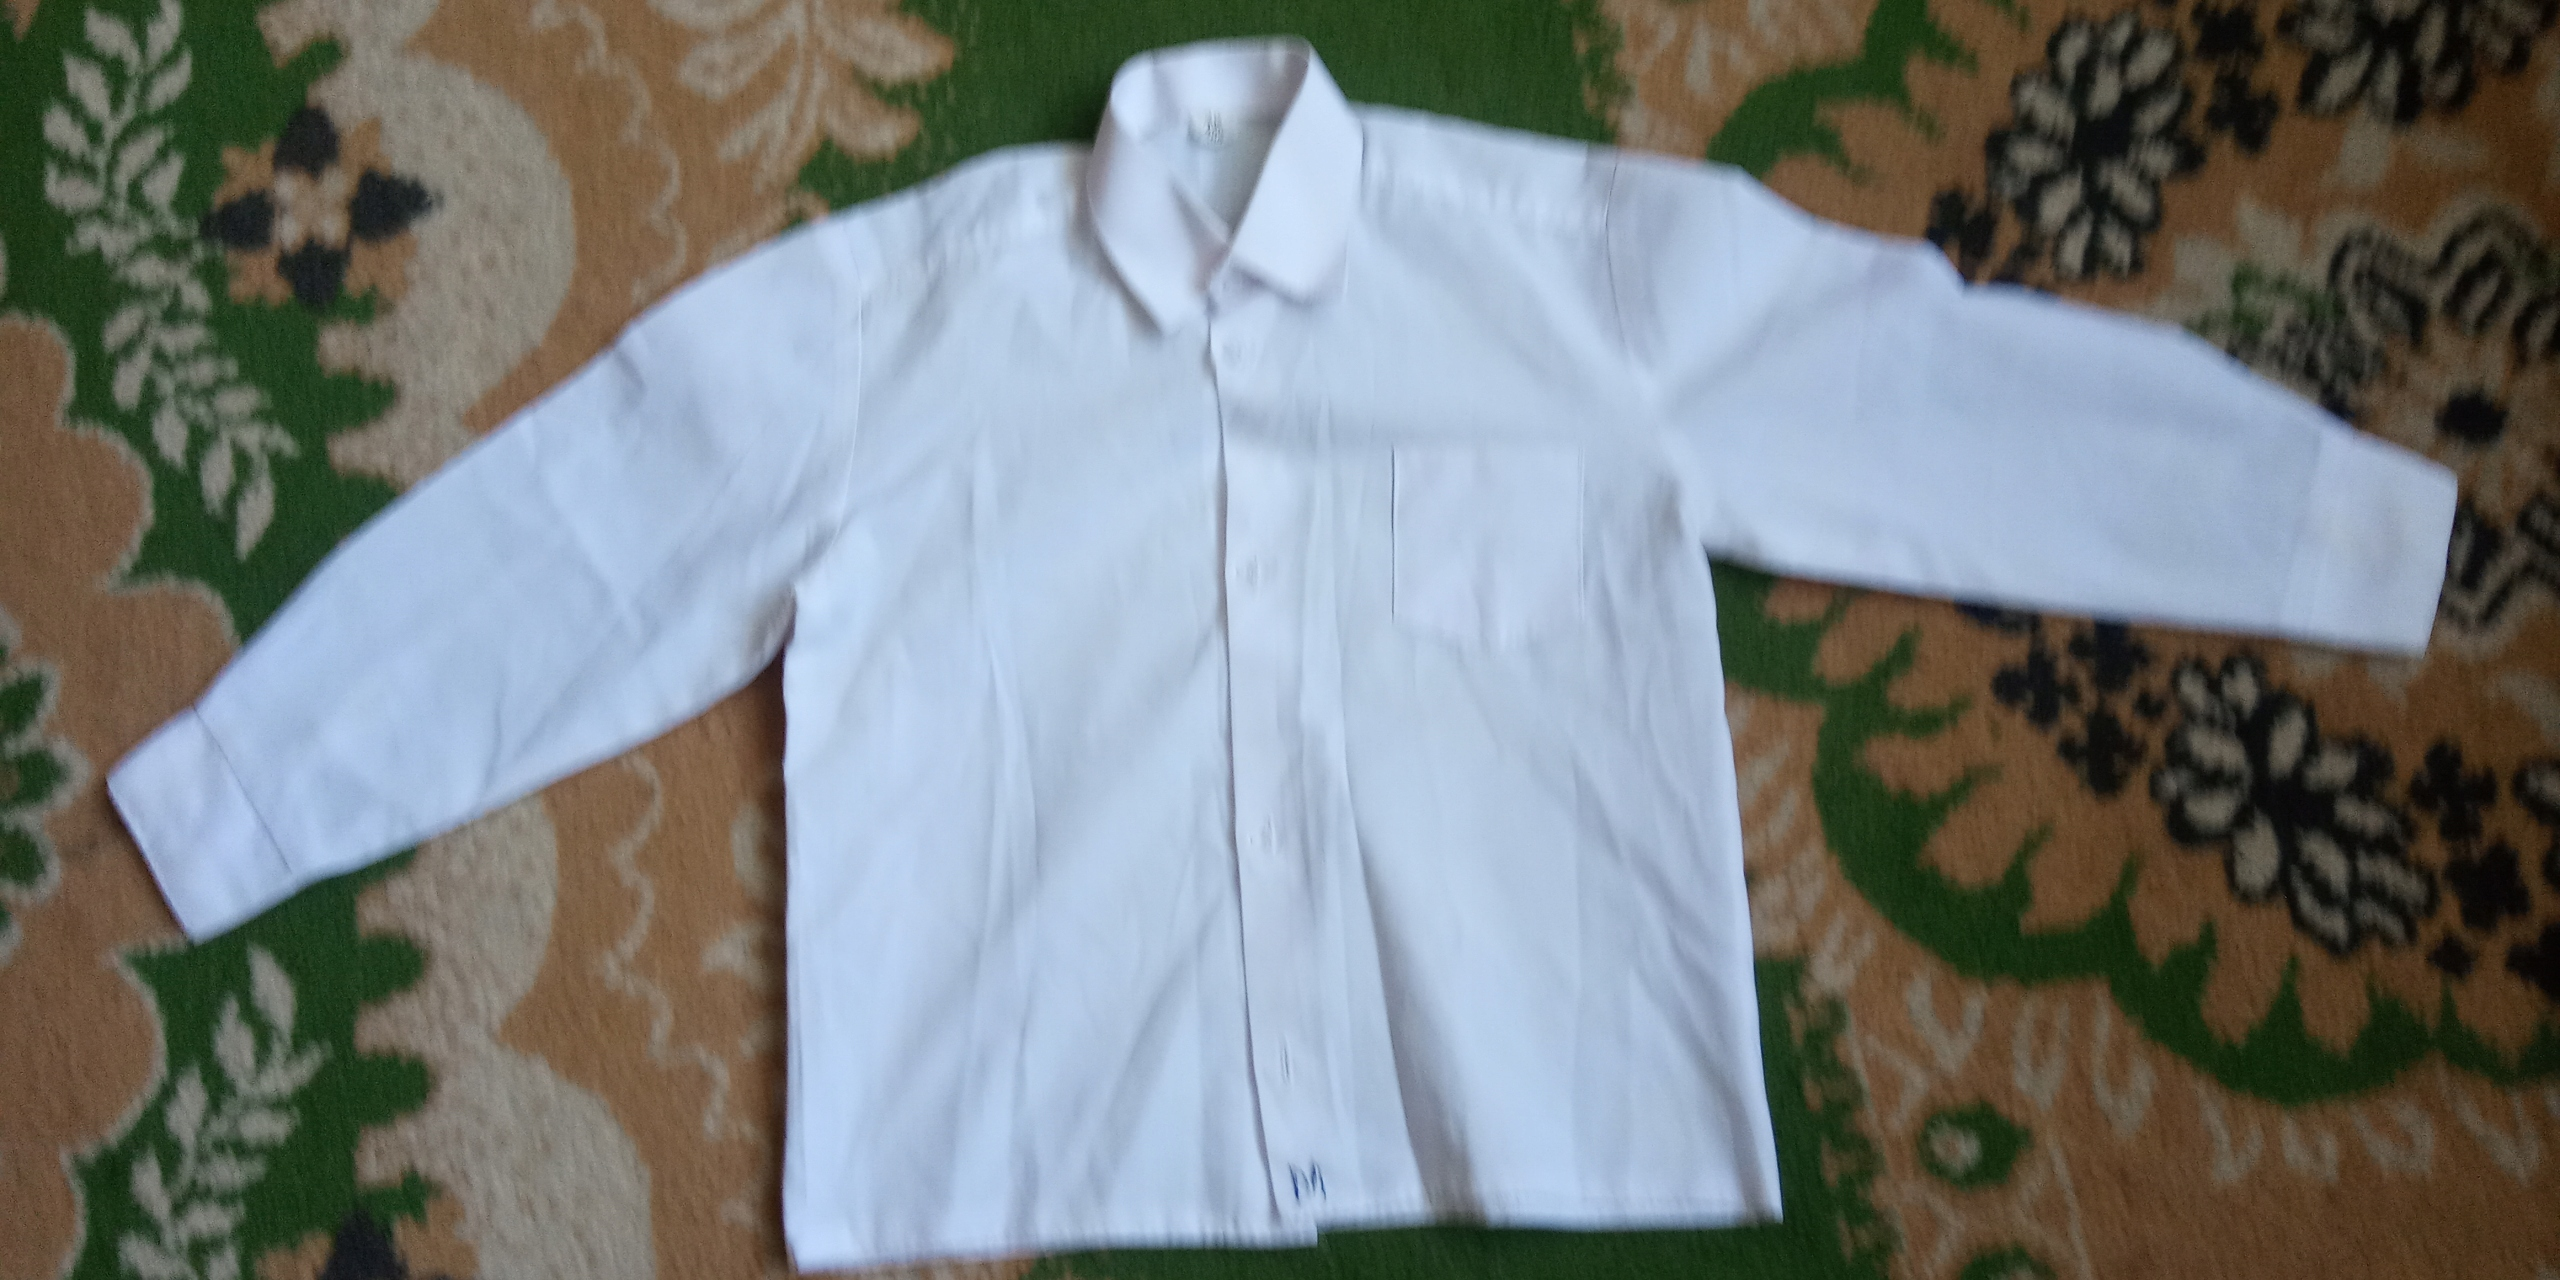 Koszula biała r. 104 chłopak 3-4 lata